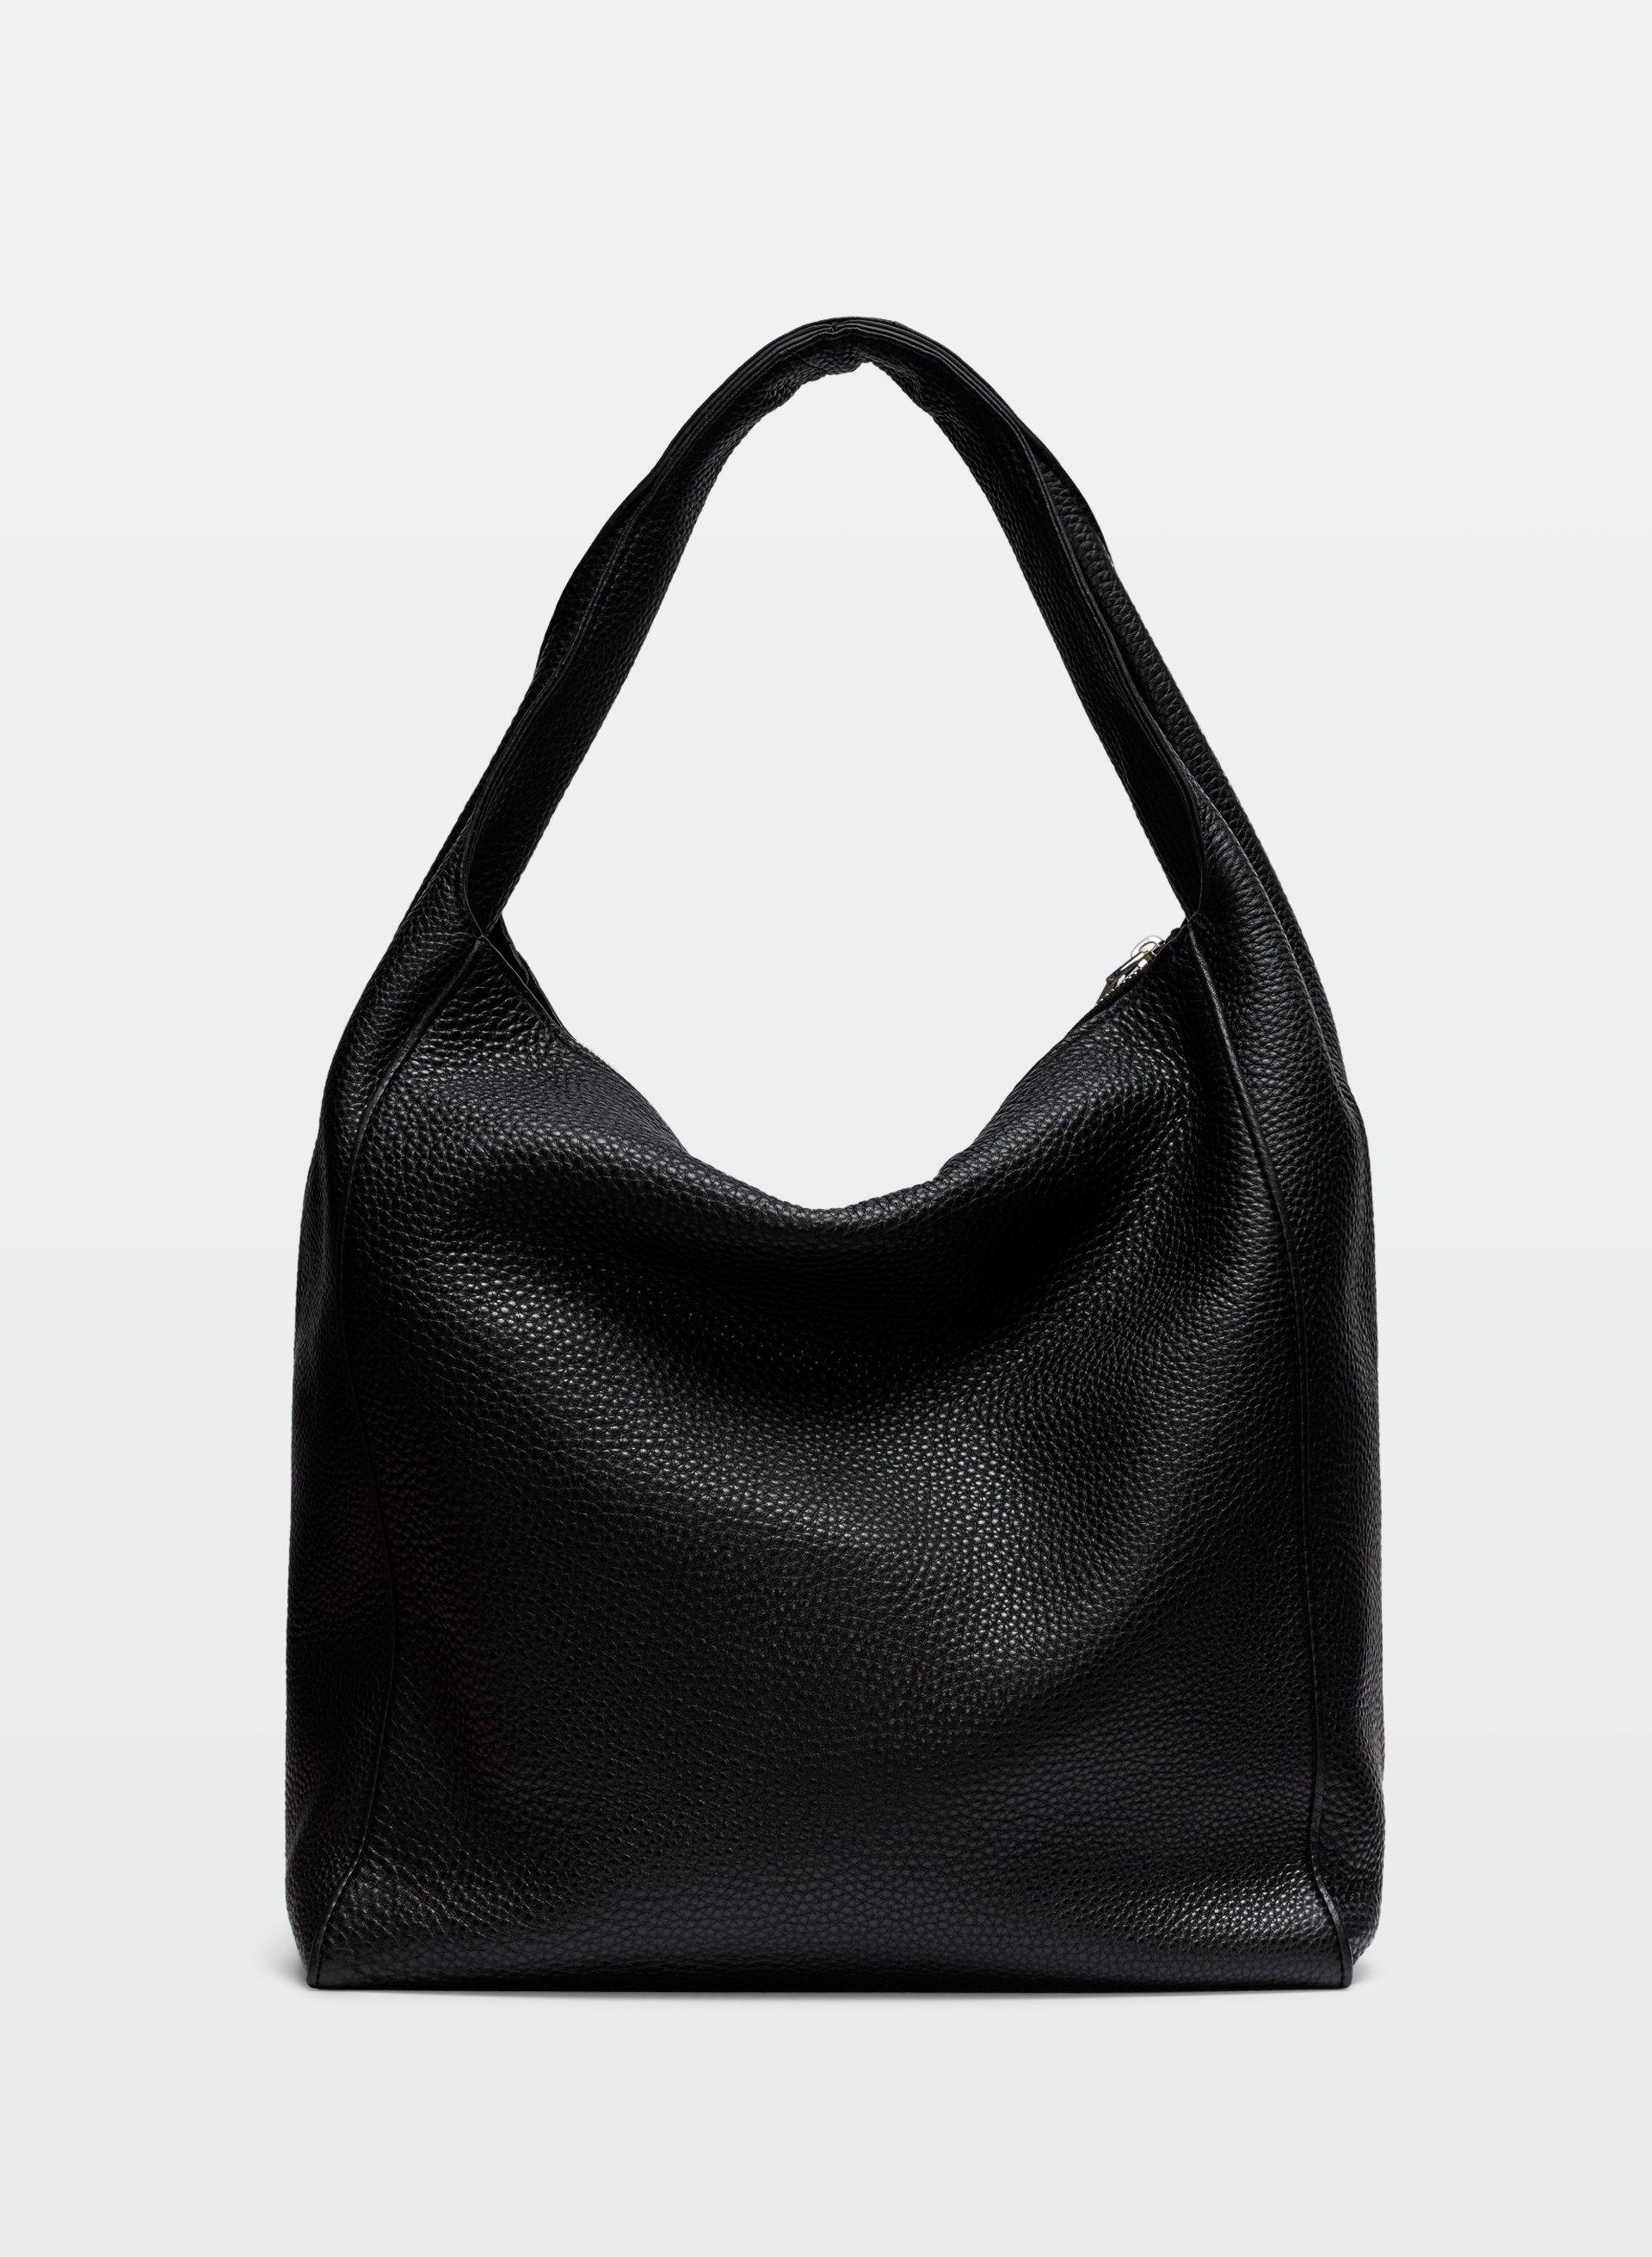 SILO HOBO BAG | Aritzia